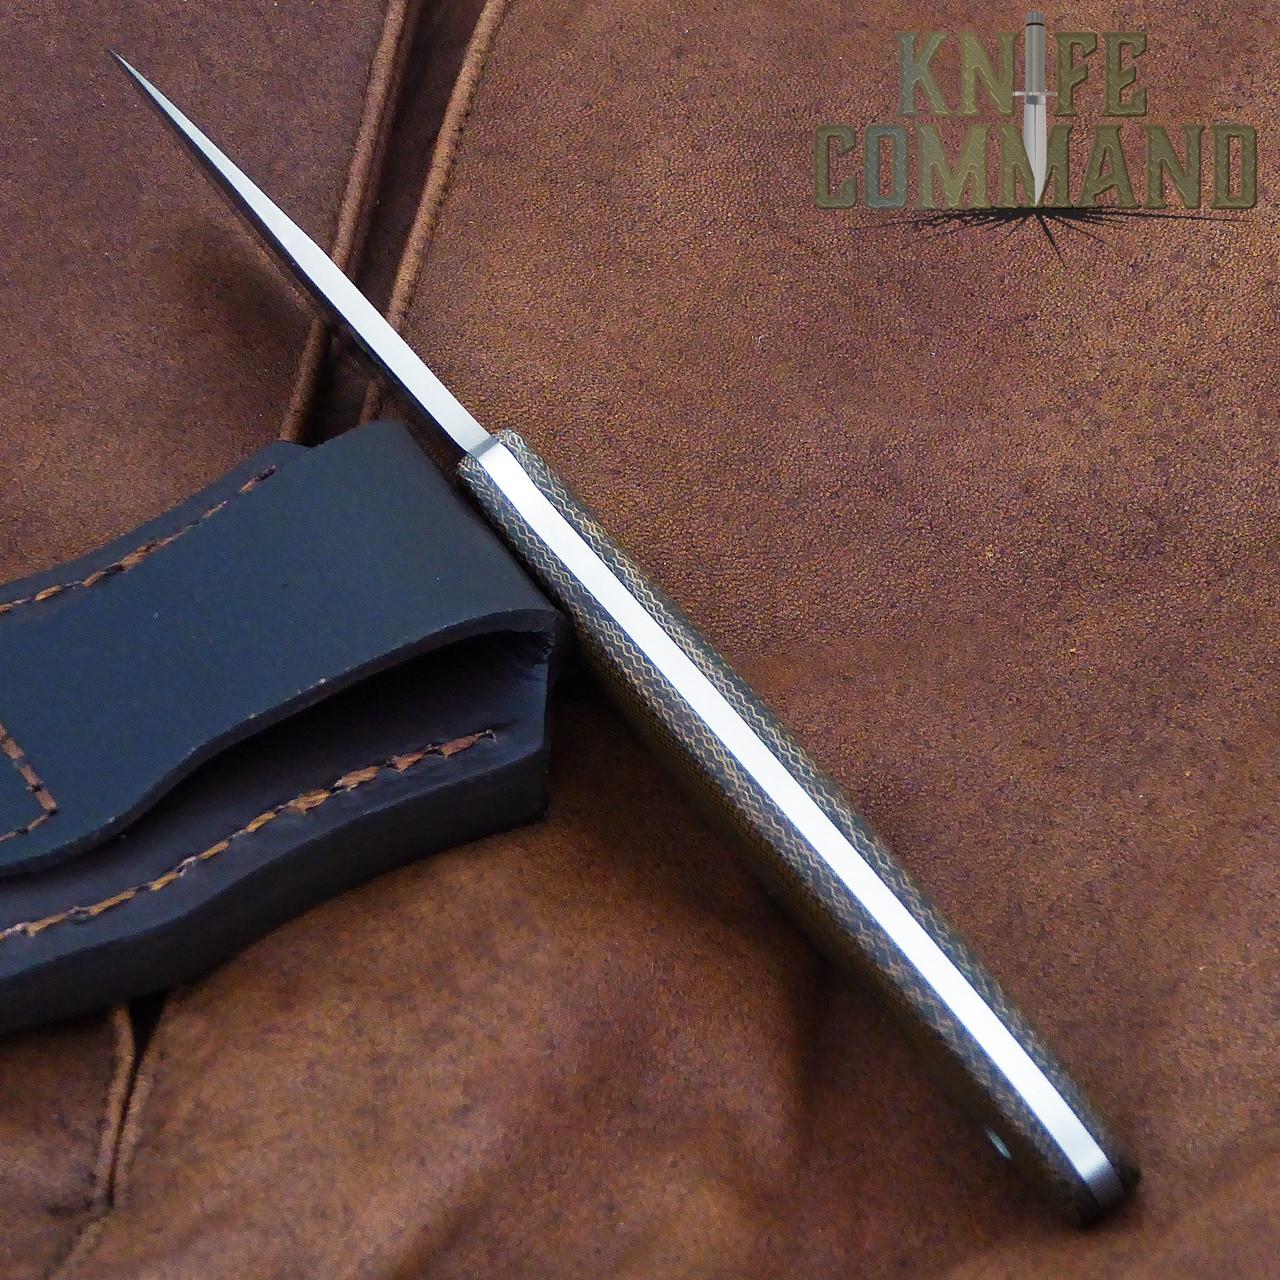 Boker Cub Lucas Burnley EDC Fixed Blade Knife 120661.   Slim design won't slow you down.